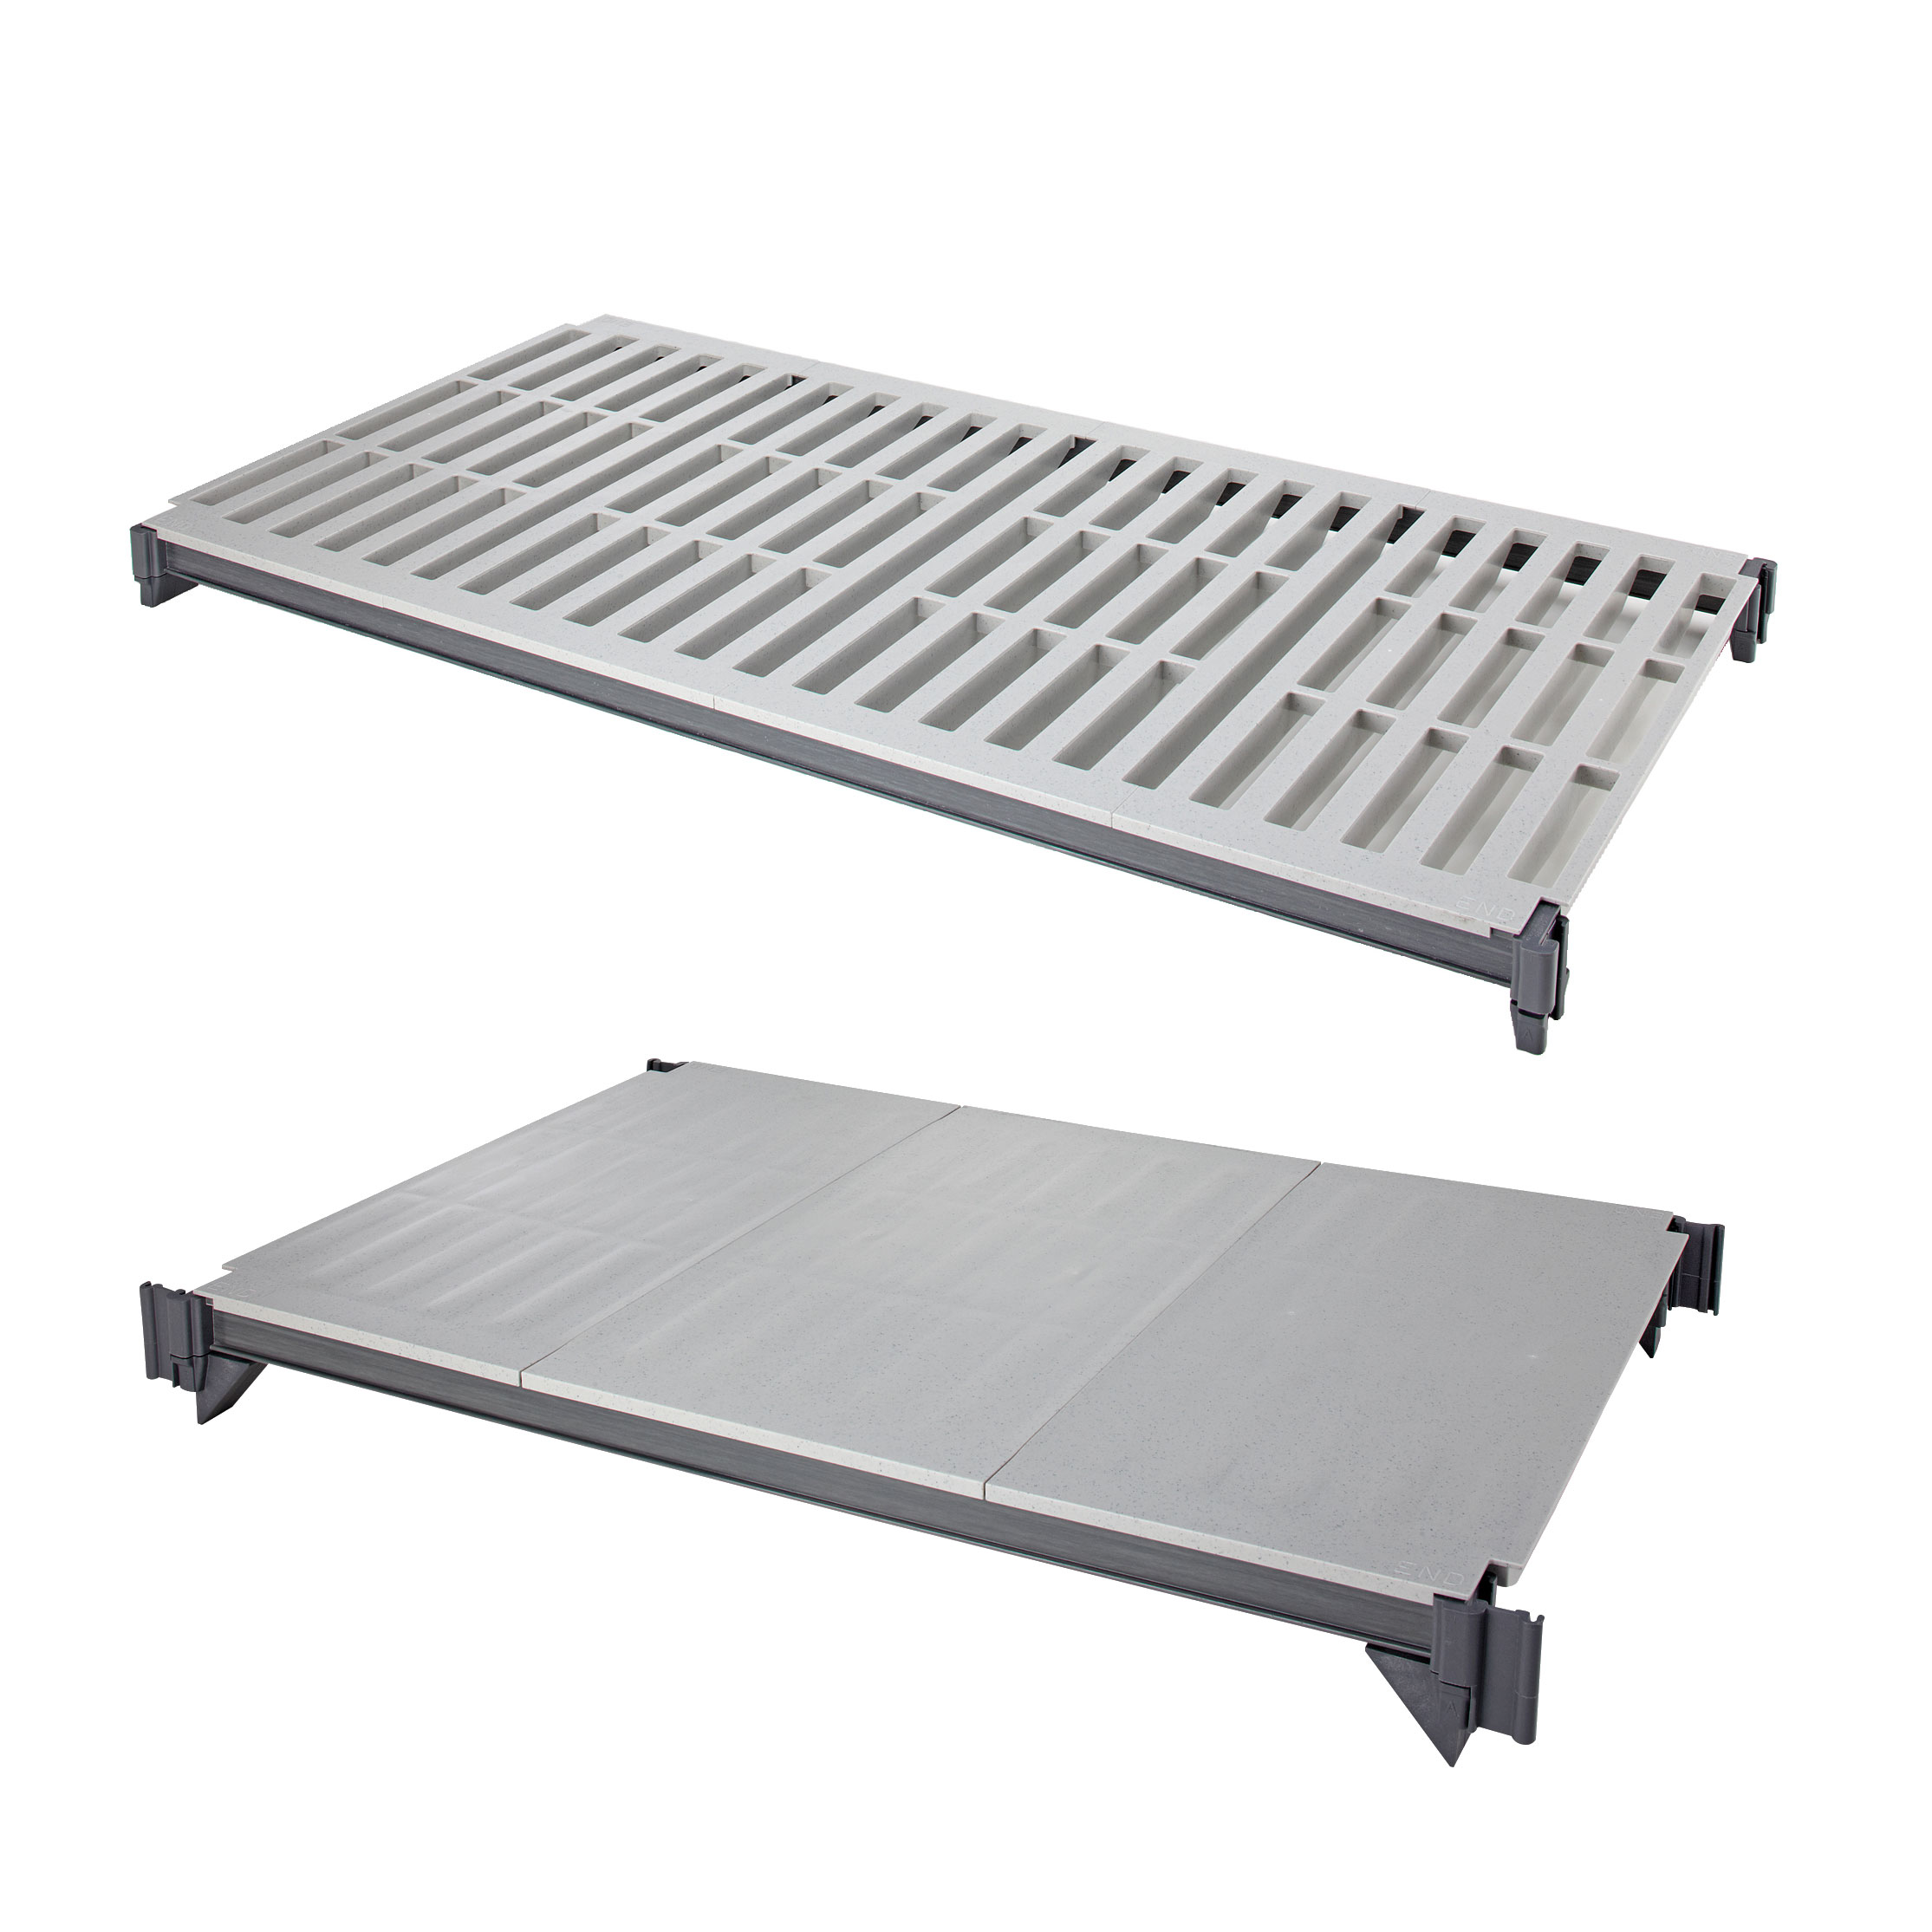 Cambro ESK2136VS4580 shelving/shelving systems